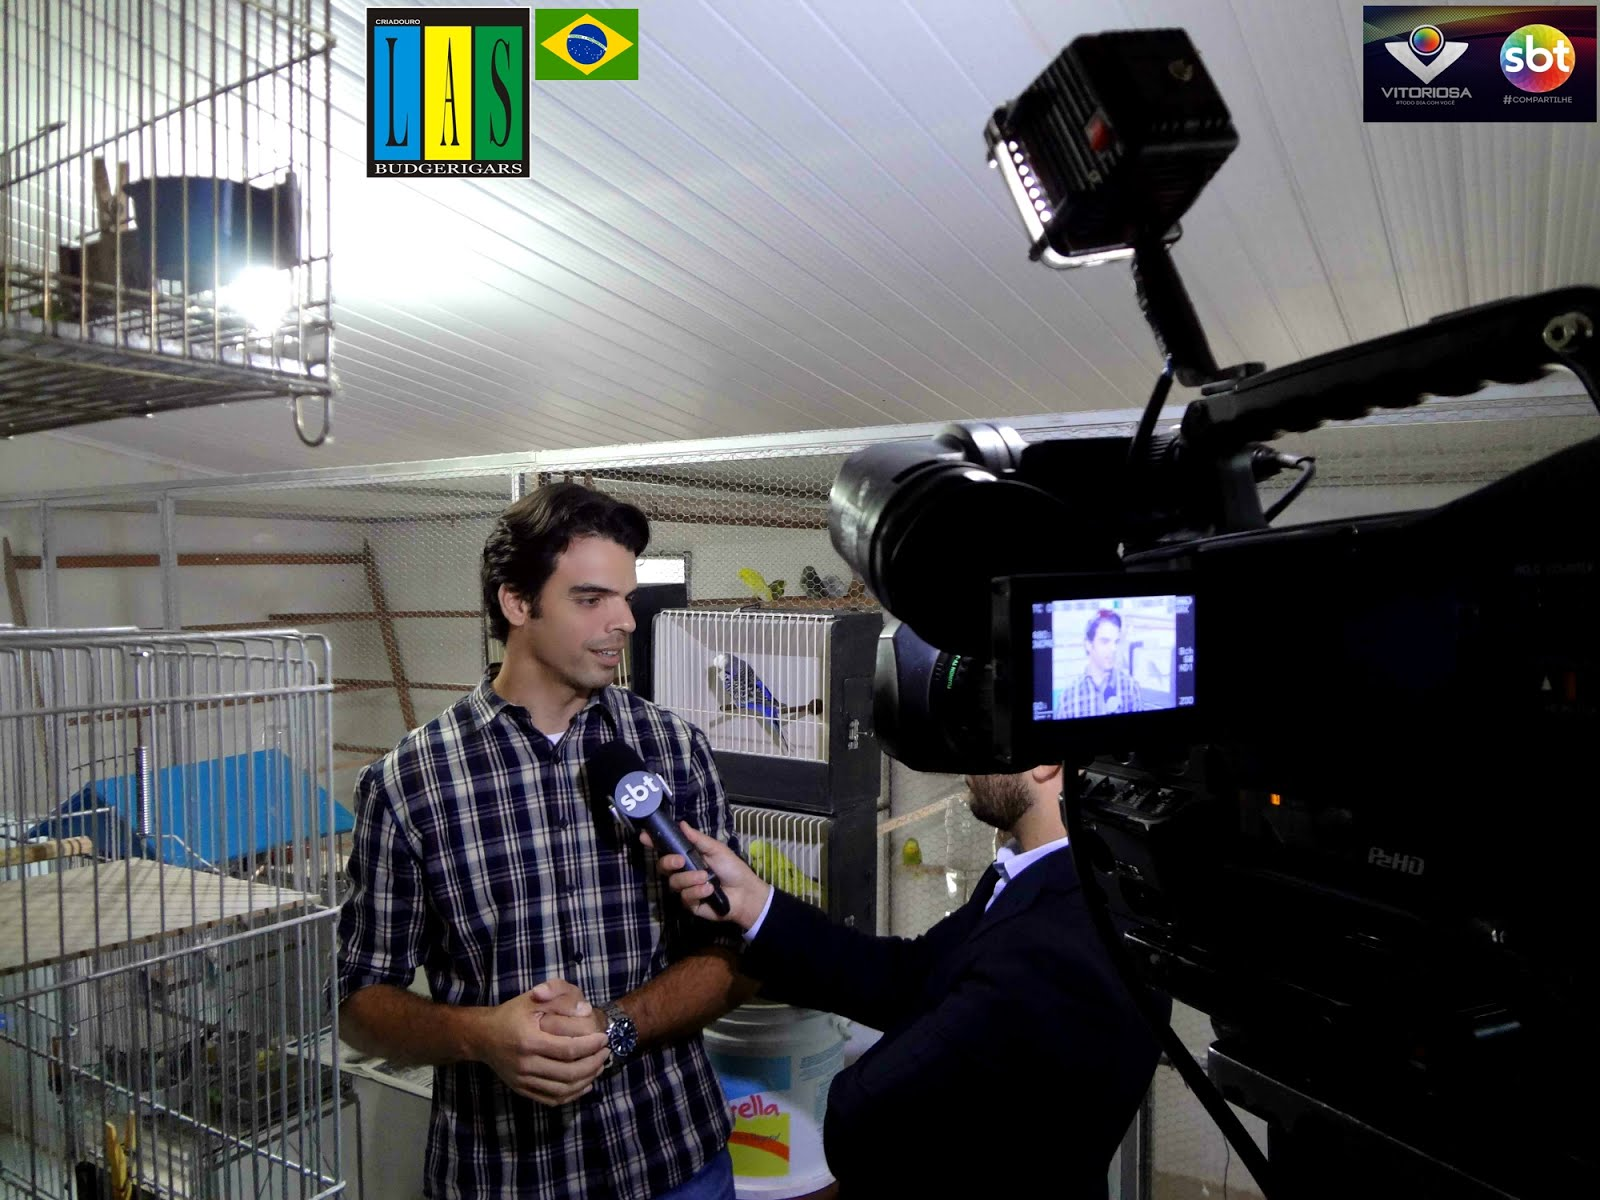 Visita da rede Vitoriosa de Uberlândia/MG (canal SBT) no CRIADOURO LAS